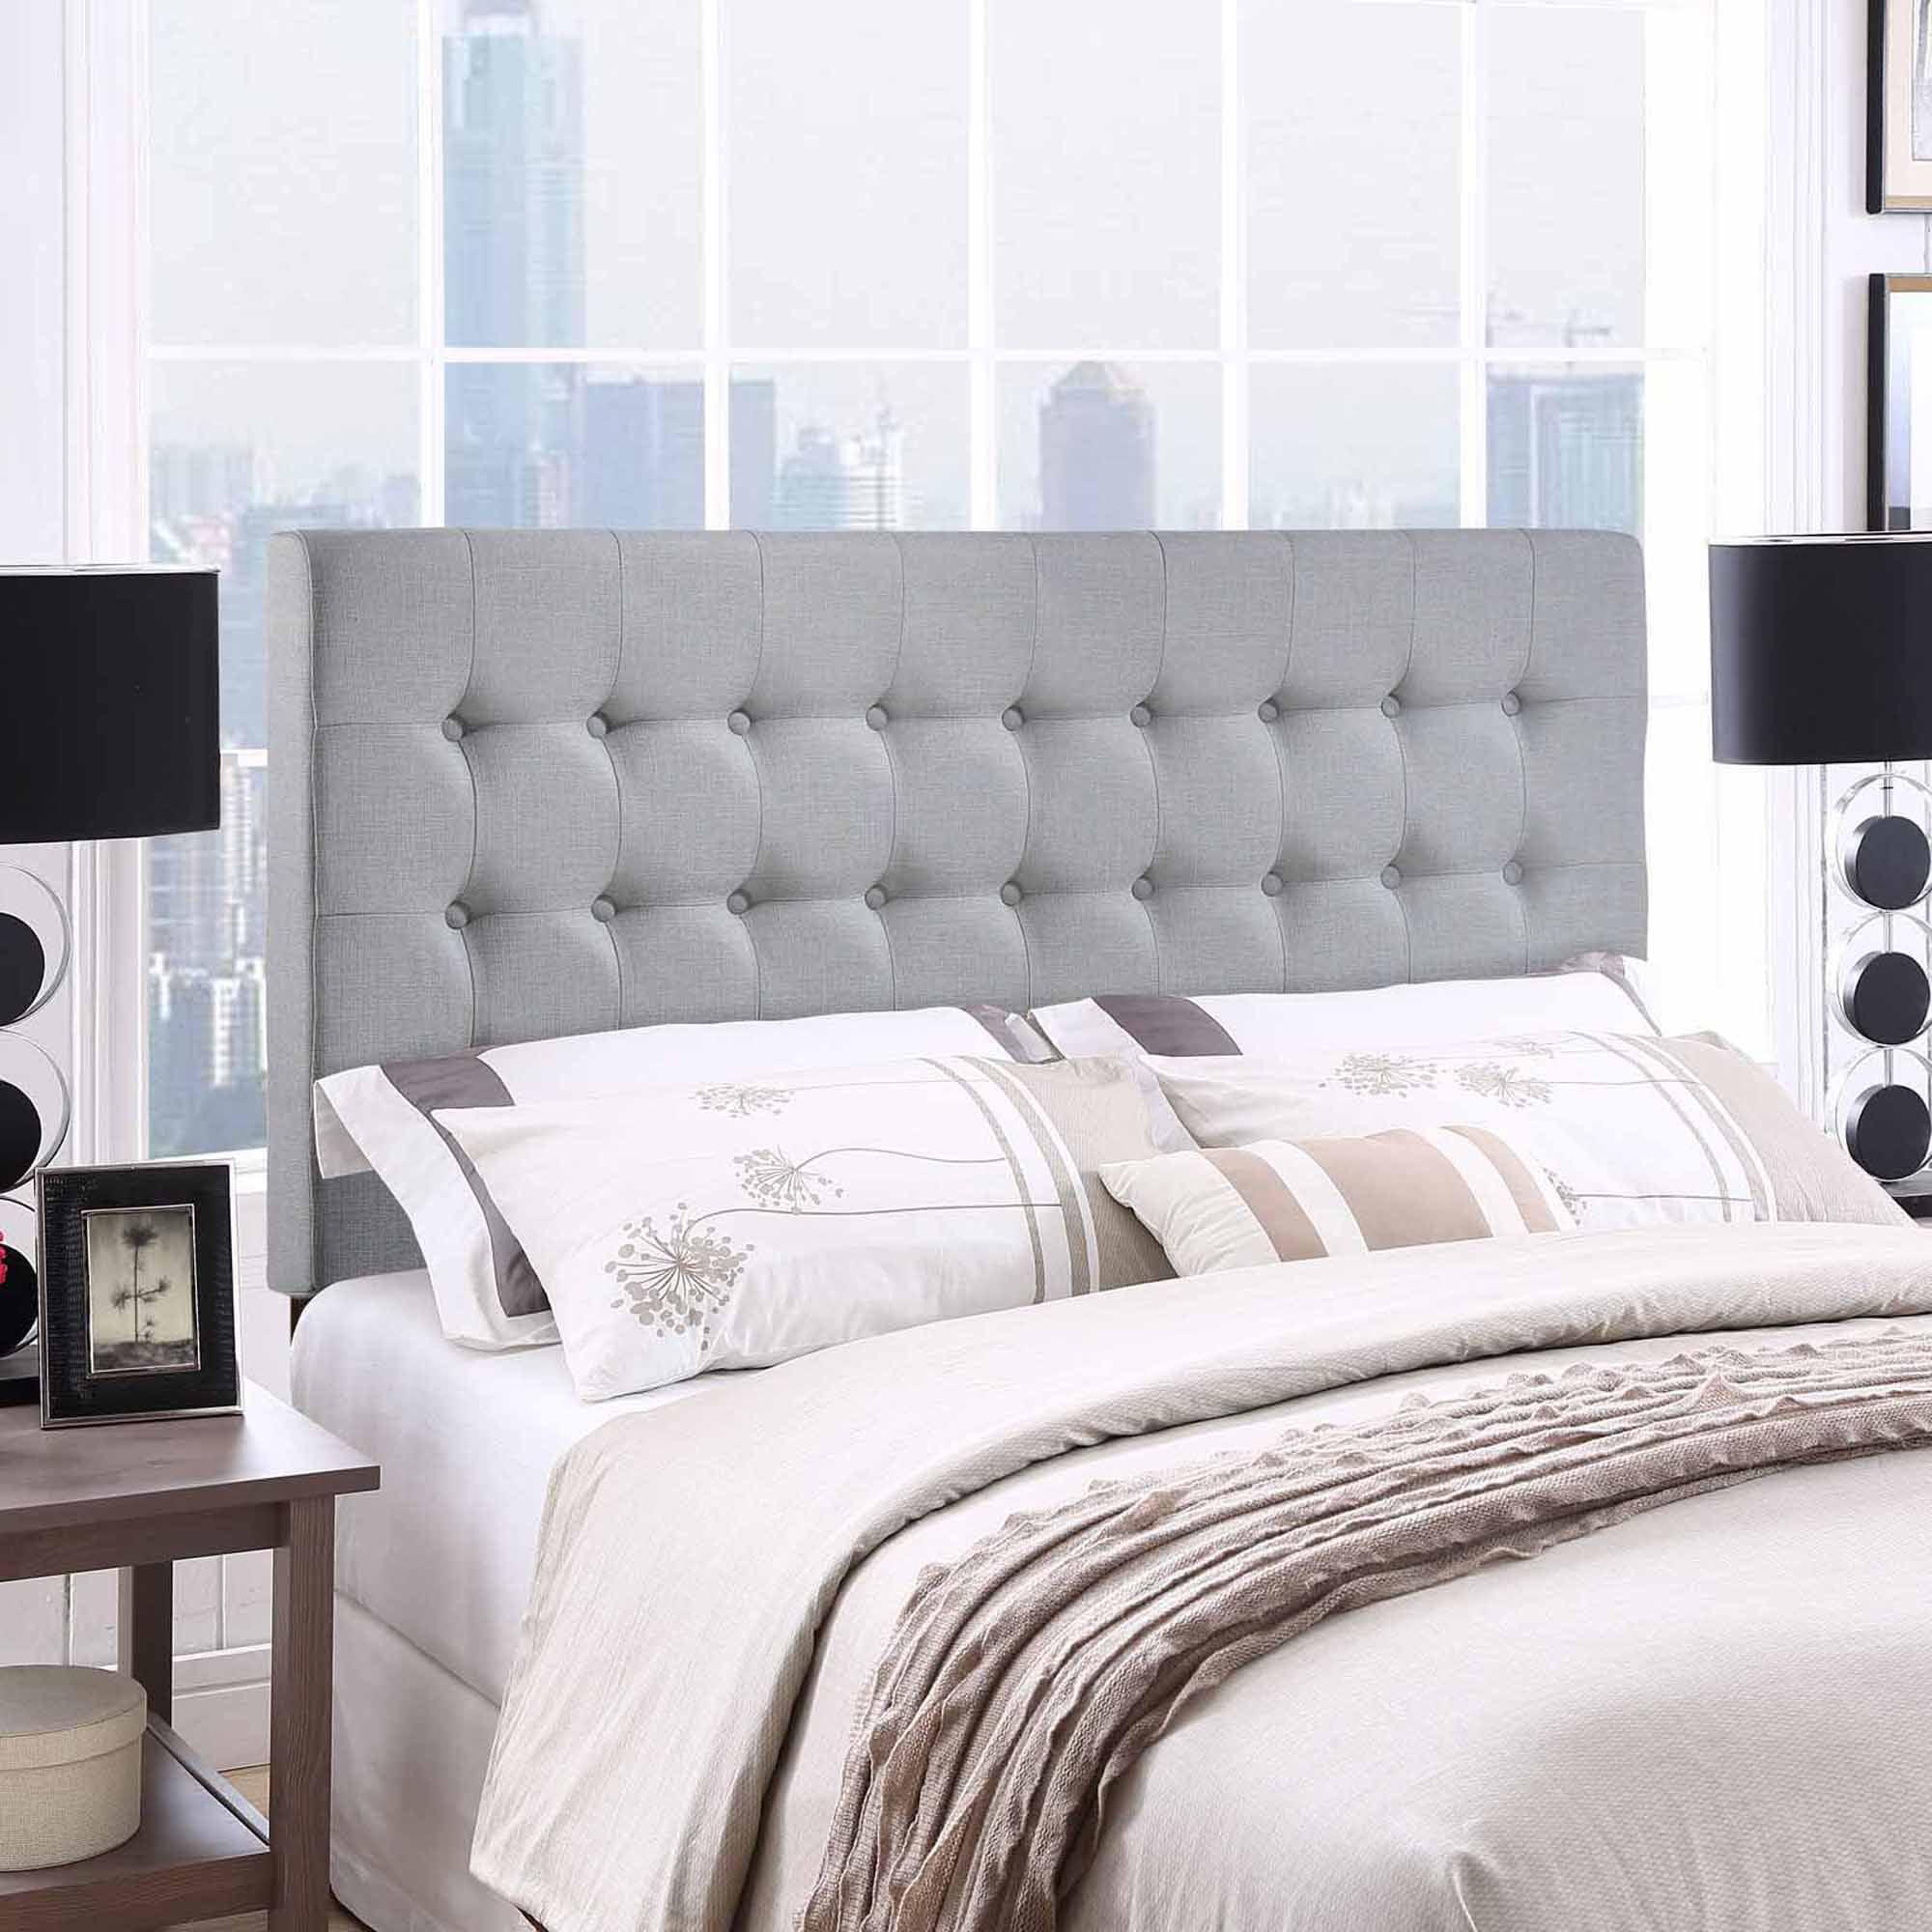 modway tinble queen tufted upholstered headboard in gray  walmartcom -